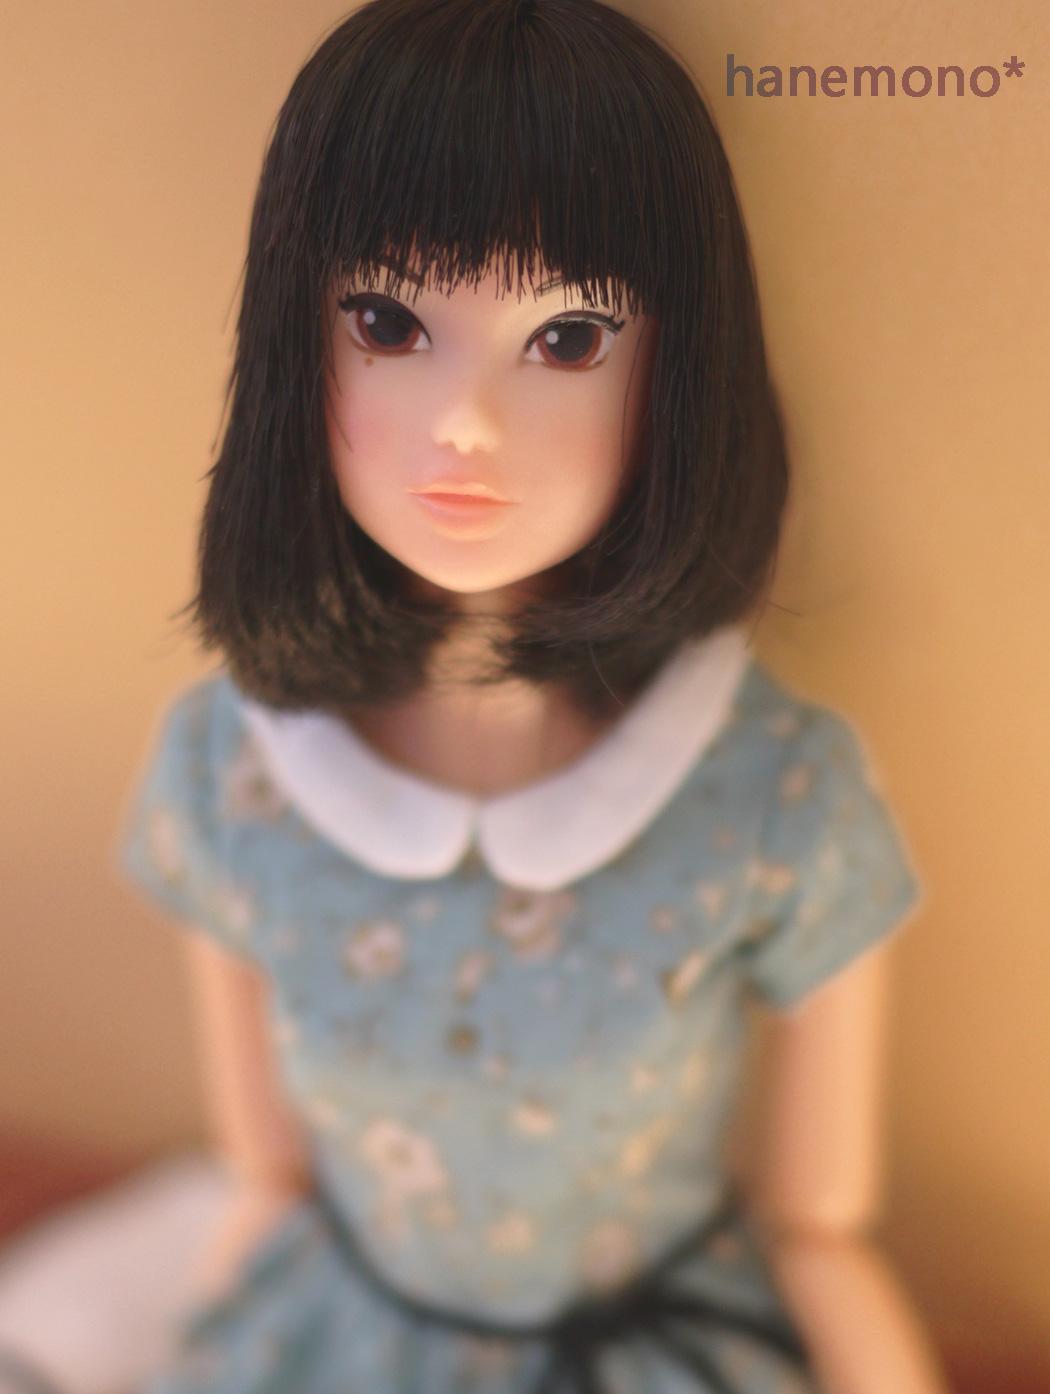 http://momoko.so-i.net/img/141004b11hd1.jpg